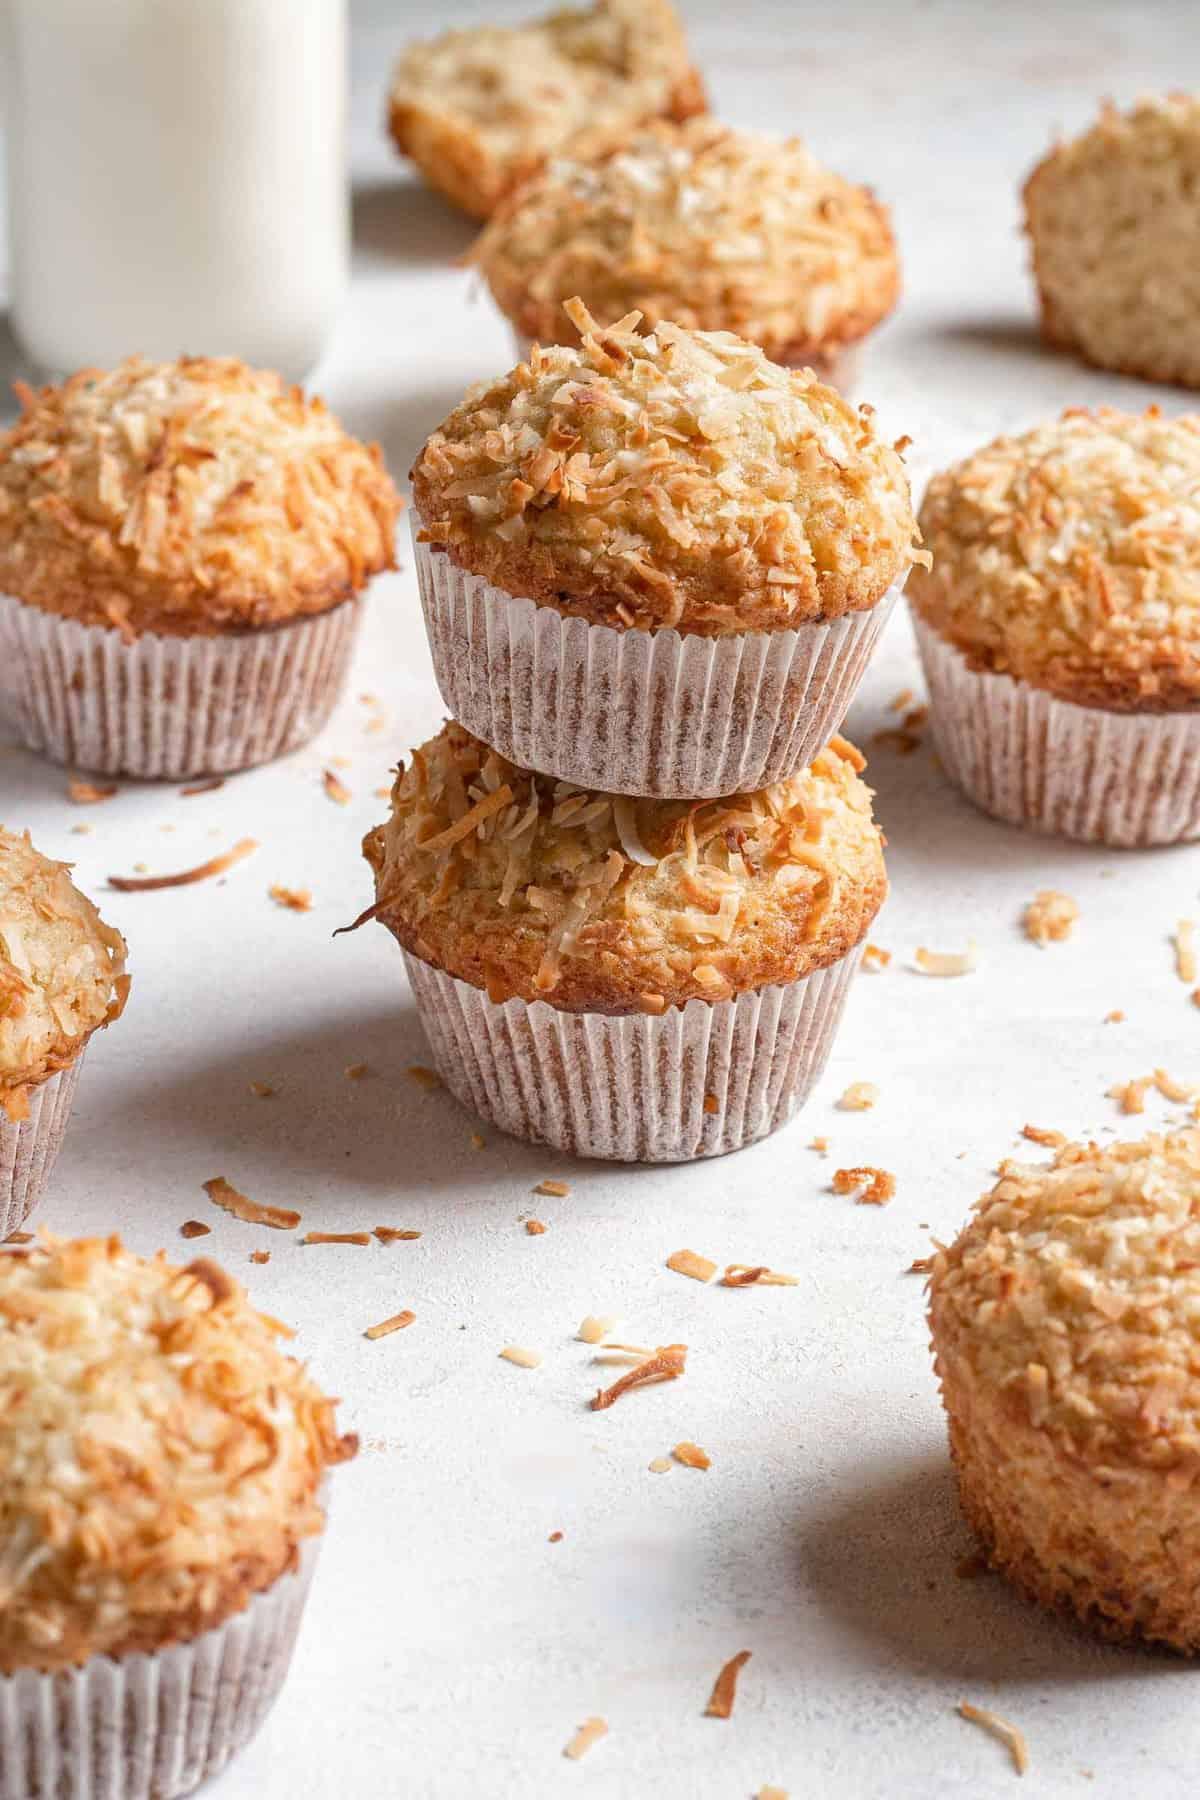 Toasted Coconut Banana Muffins recipe